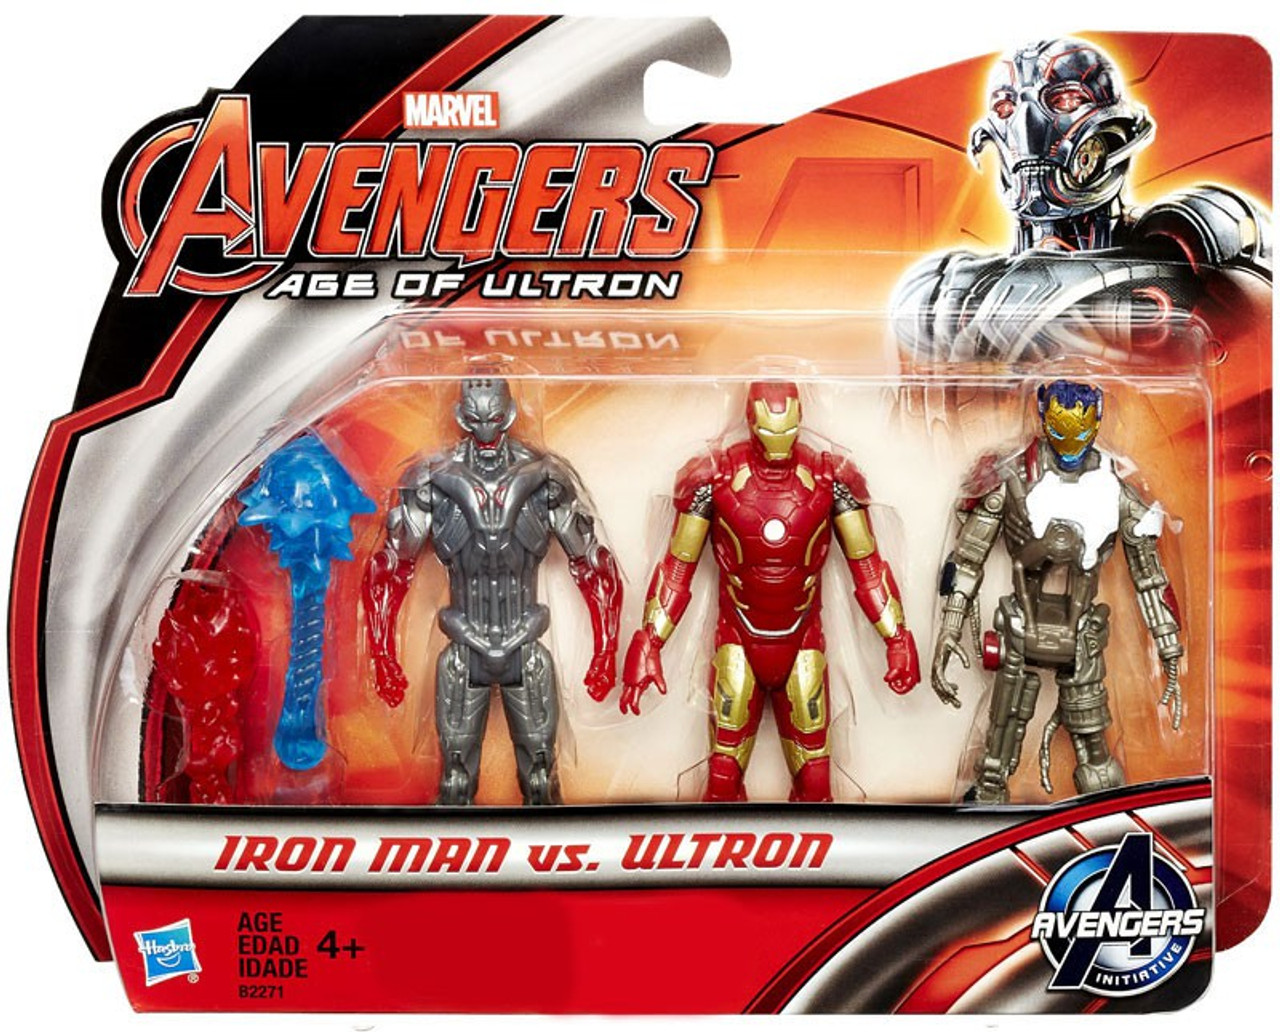 2015 Hasbro Target Exclusive Avengers Age of Ultron Iron Man vs Ultron 3 Pak MOC